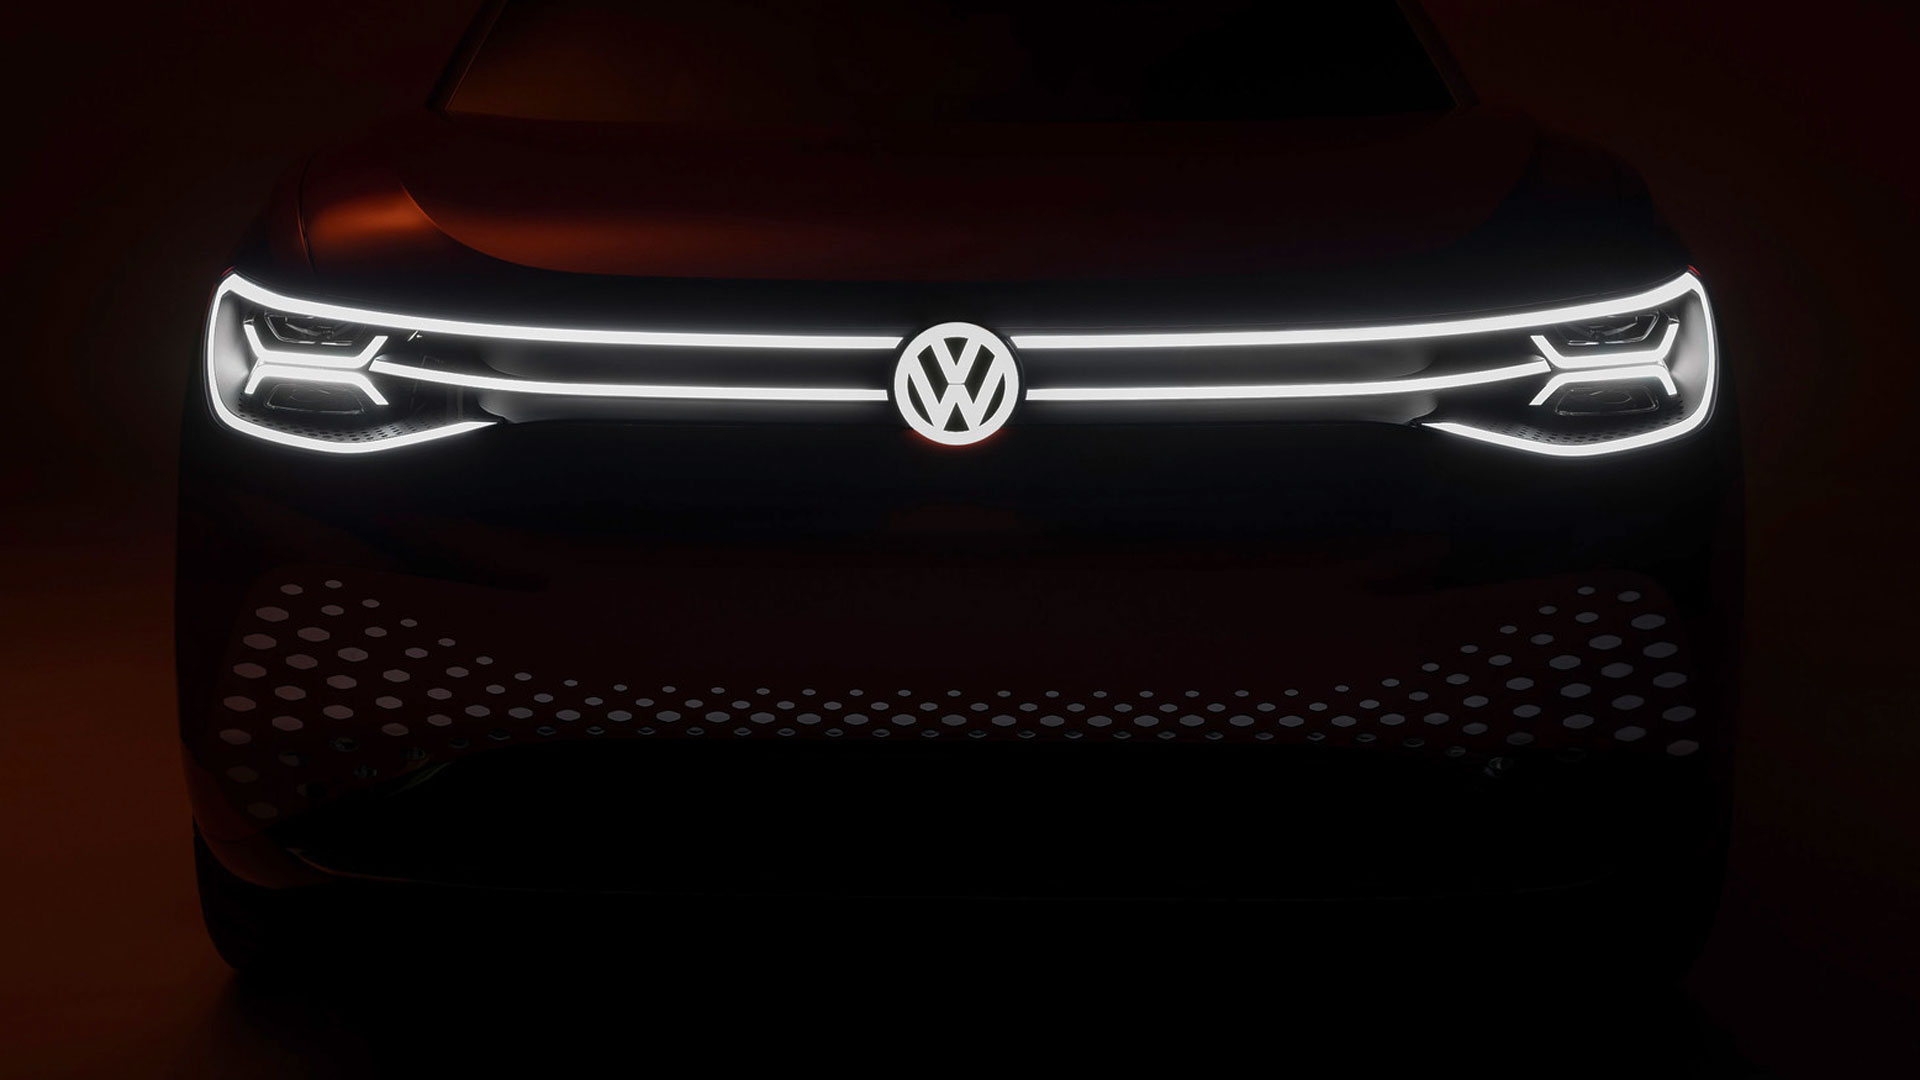 Best-selling car brands 2019